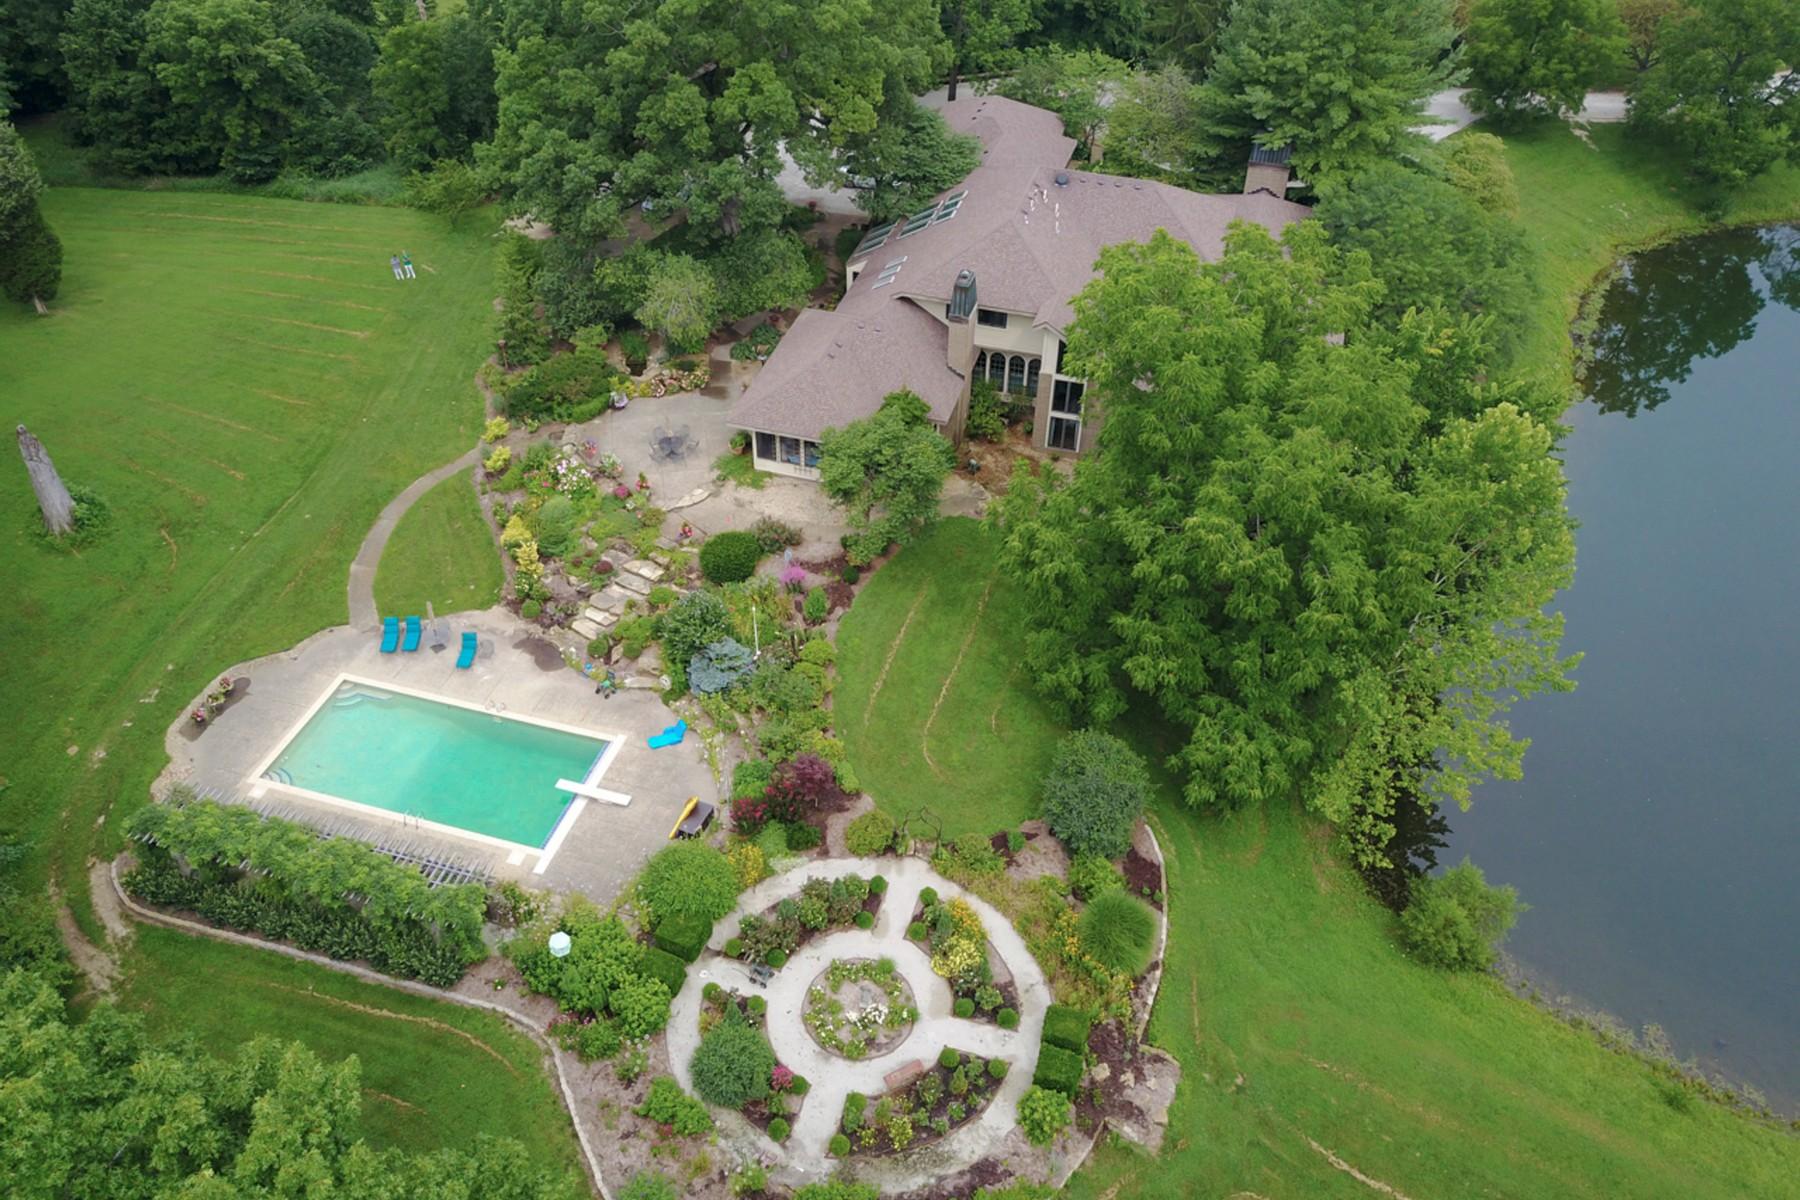 农场 / 牧场 / 种植园 为 销售 在 Scenic 178 Acre Equestrian Estate 2225 E Maple Turn Road Martinsville, 印第安纳州 46151 美国